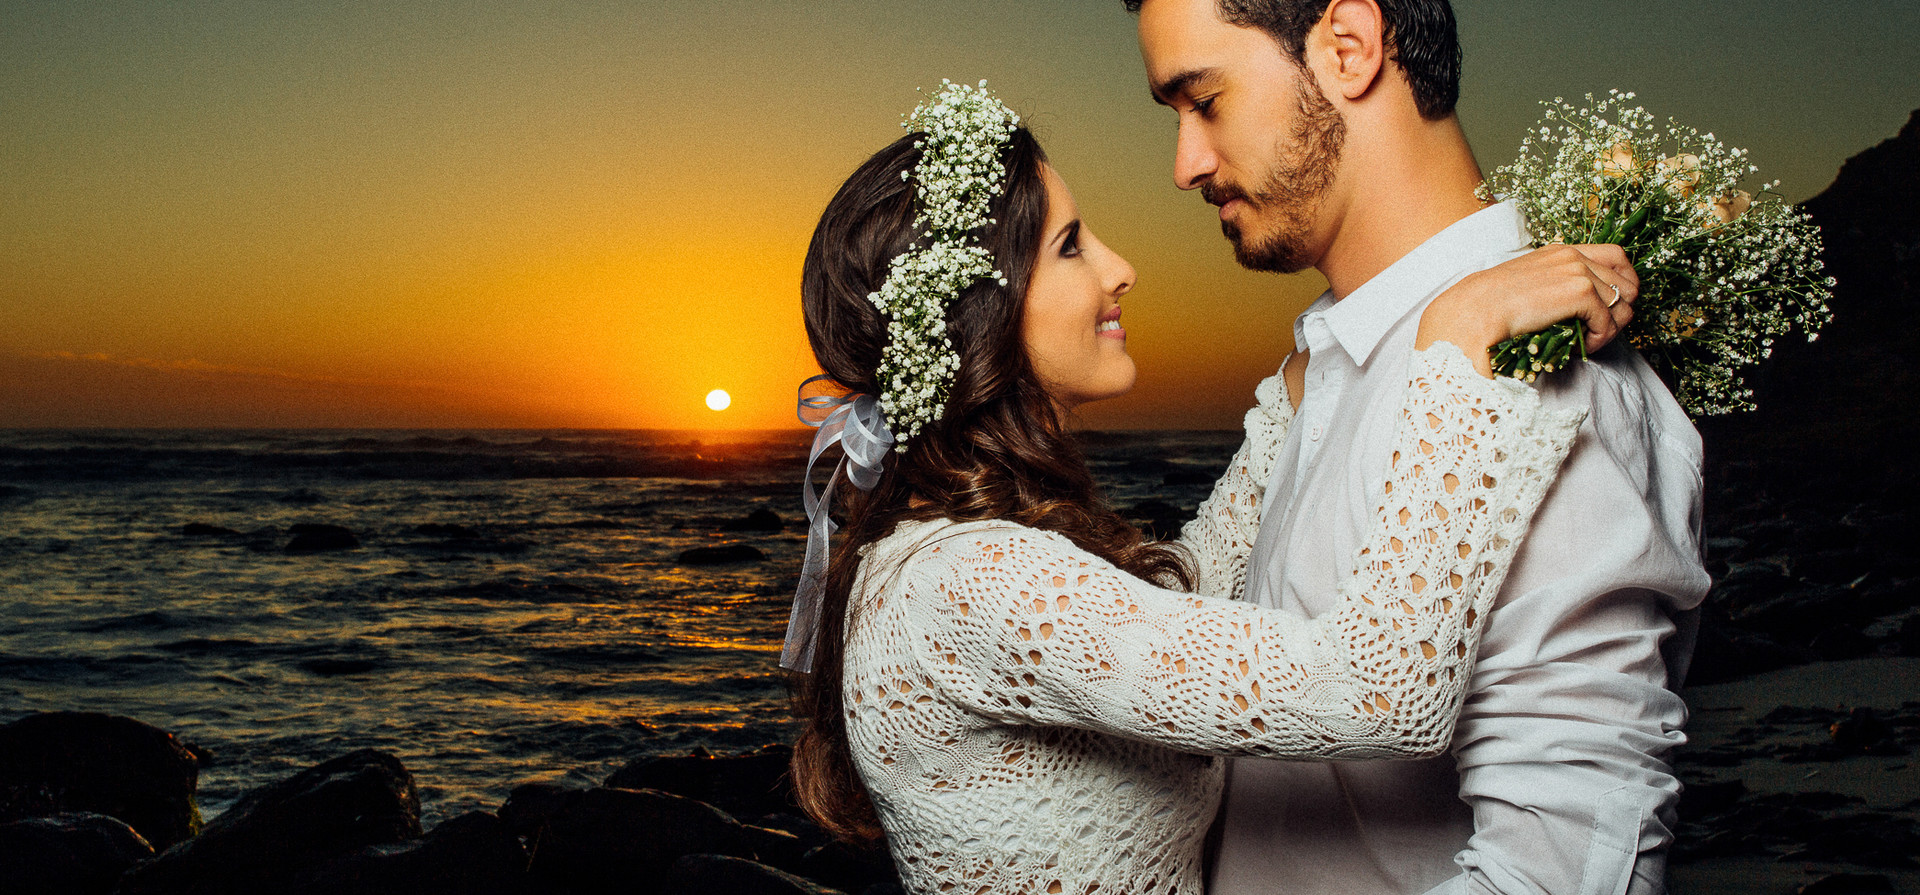 Contate Márcio Torrez -  Fotógrafo de Casamentos, Famílias e Ensaios.